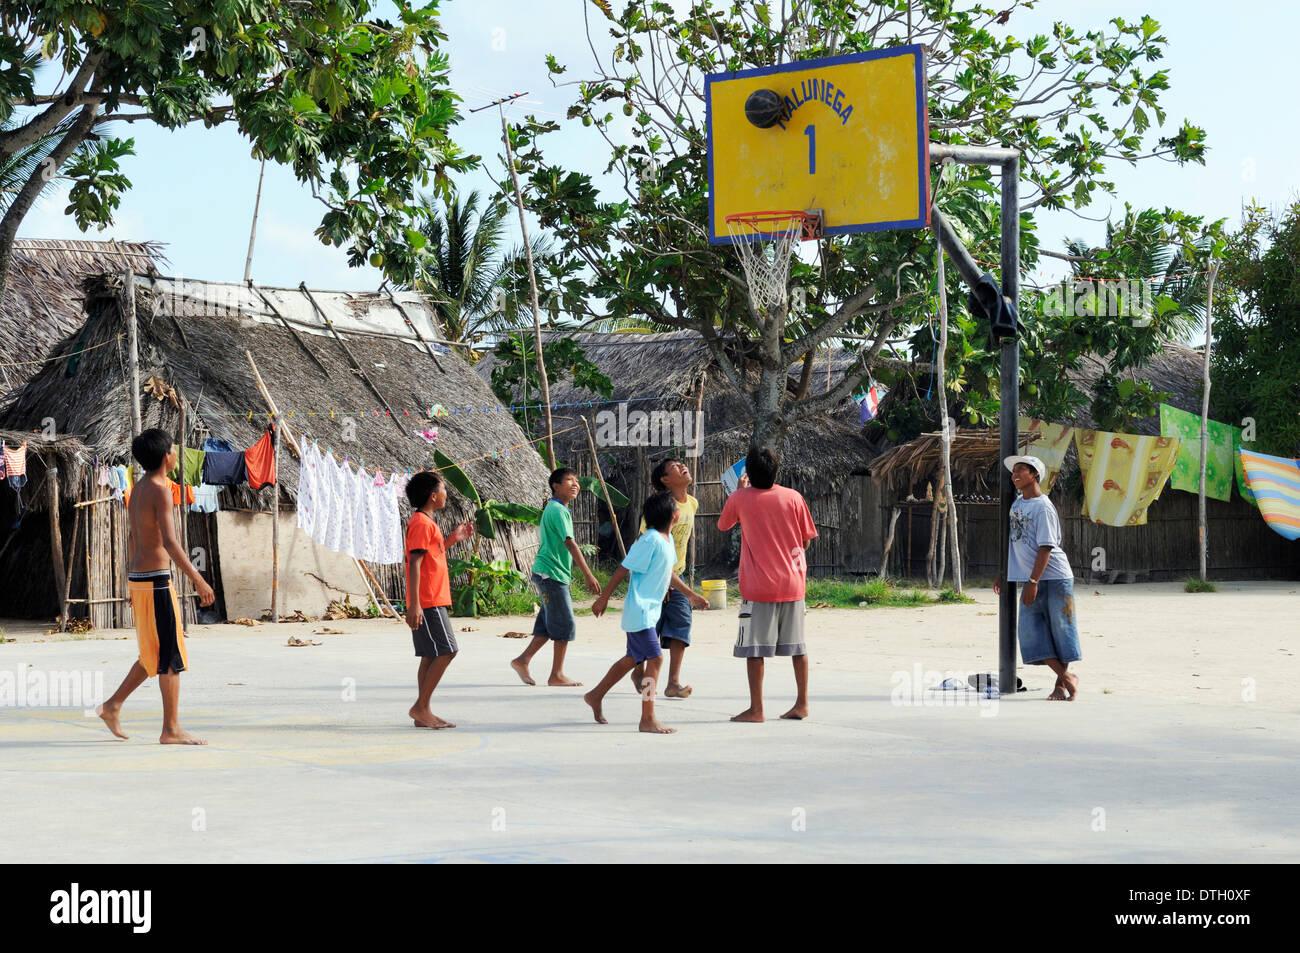 Children play basketball in a Kuna Indian village, Nalunega, San Blas Islands, Panama - Stock Image